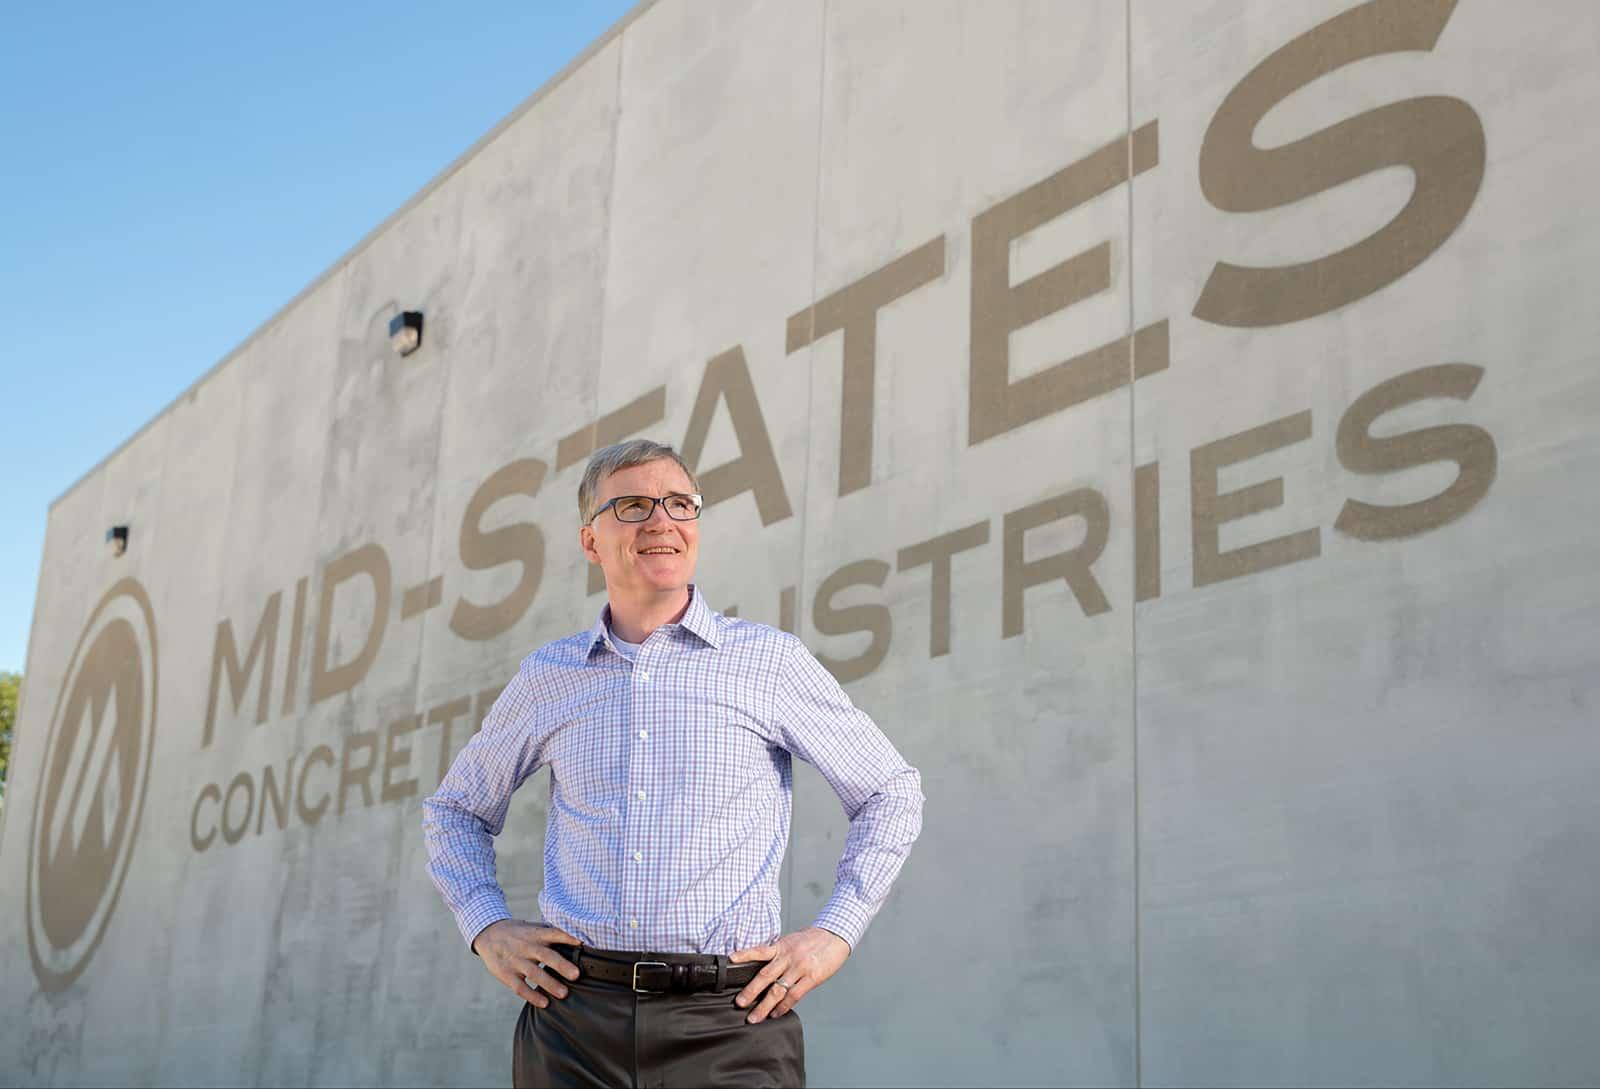 Hagen Harker, President, Mid-States Concrete Industries